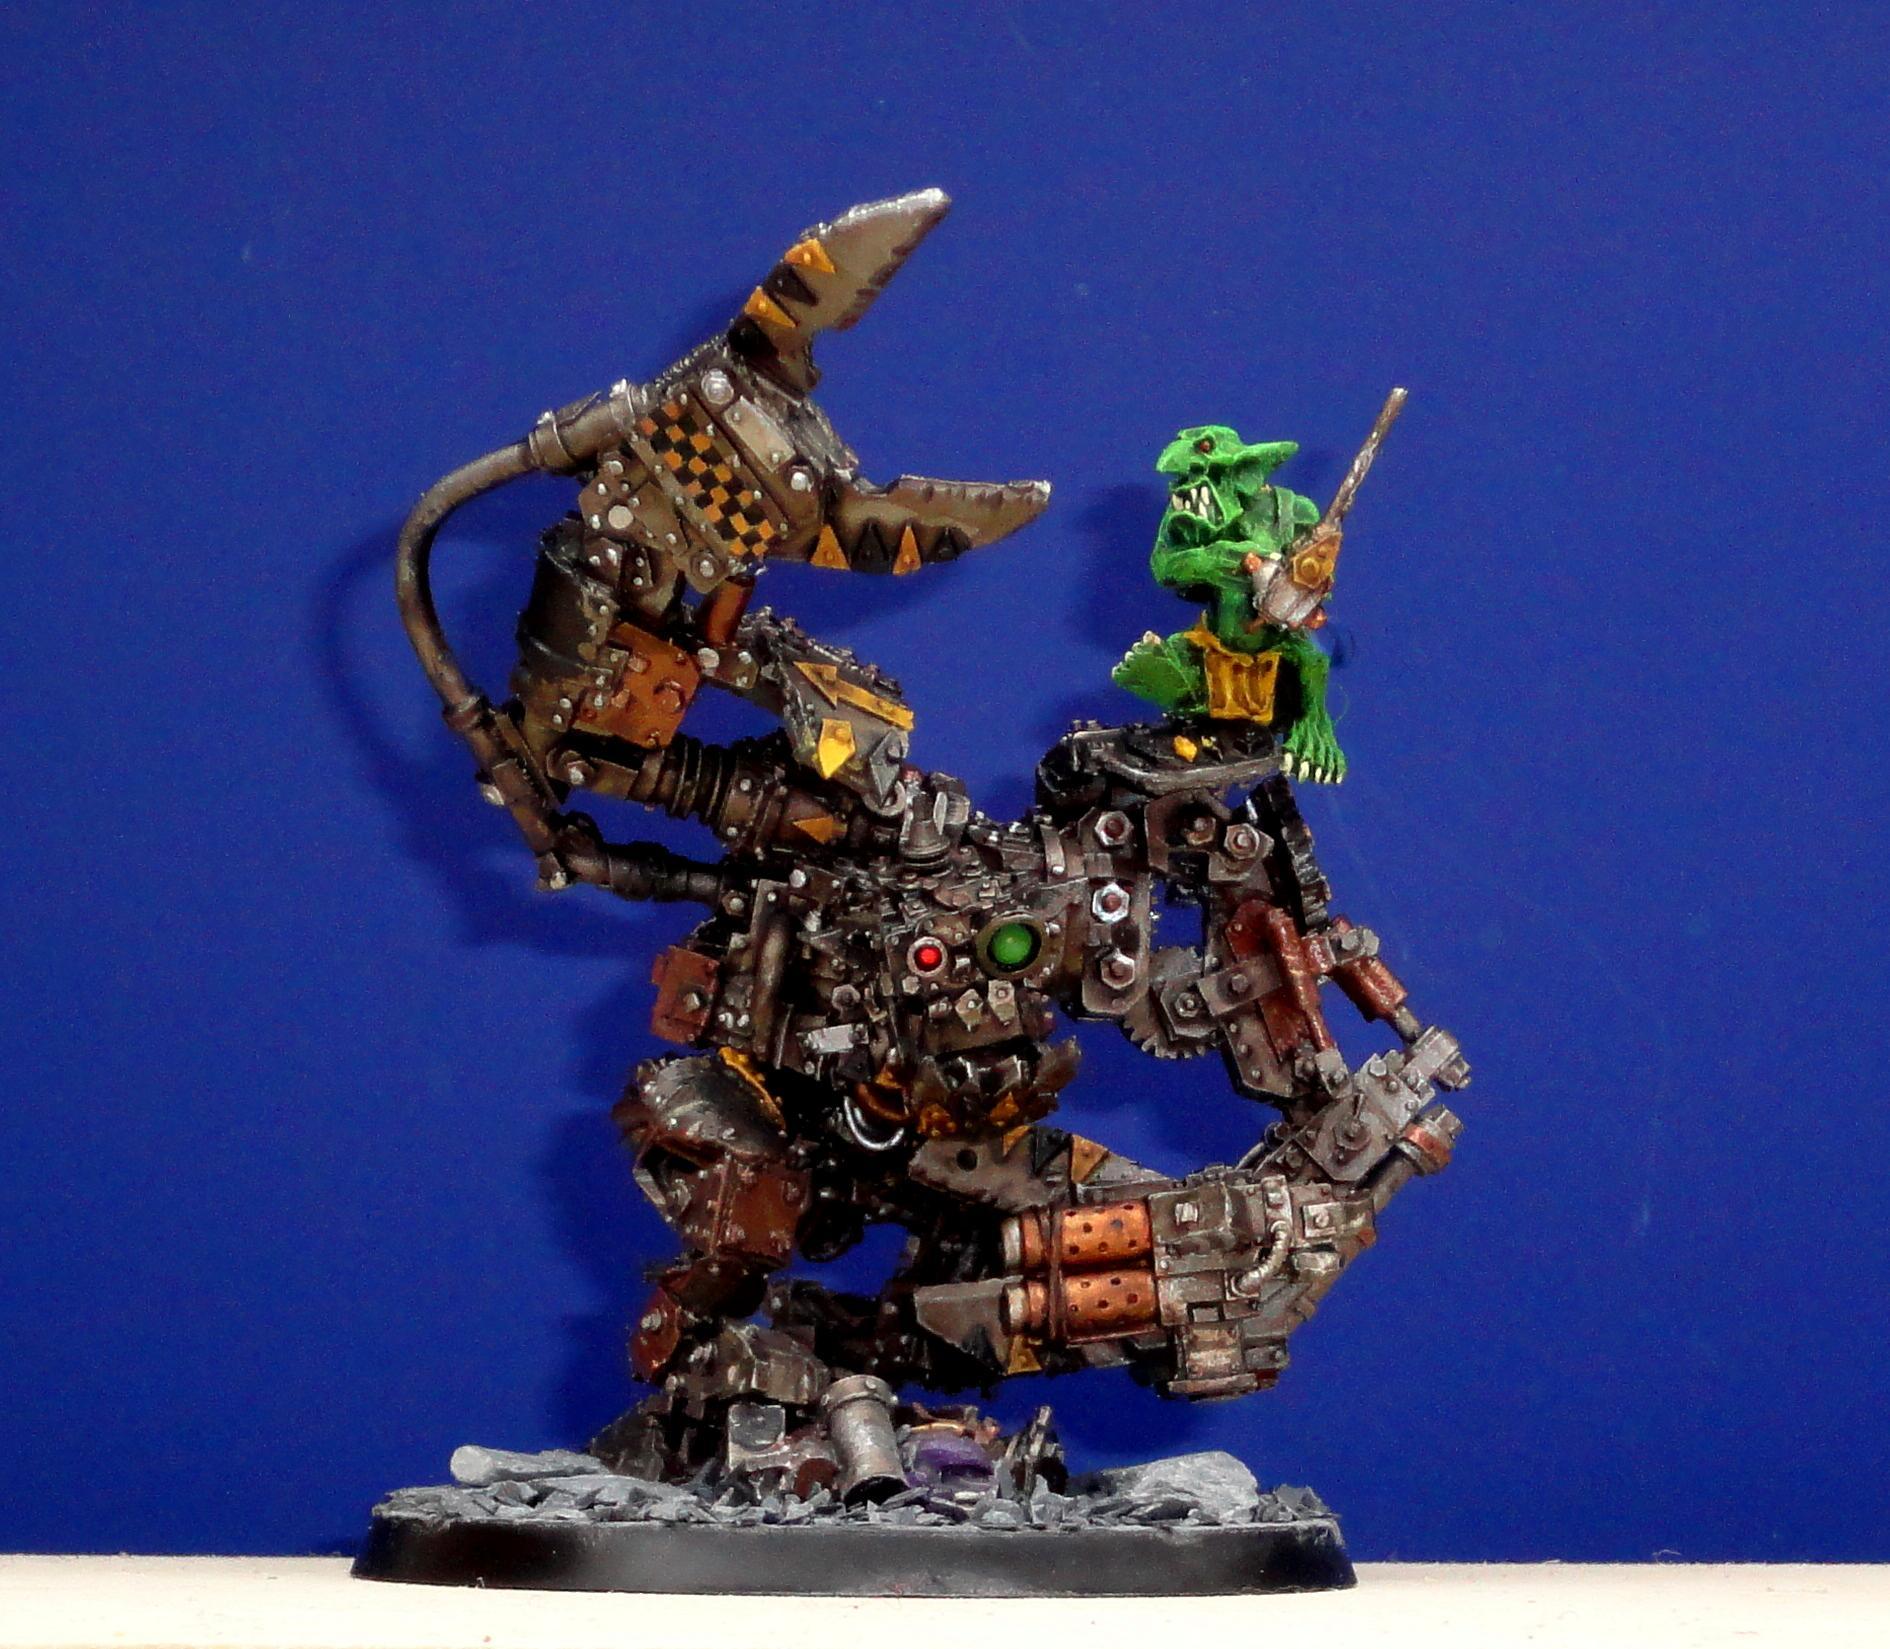 Bad, Big, Bot, Drinker, Forge World, Gretchin, Grots, Mekboy, Moon, Orks, Power, Runt, Runtbot, Soul, Space, Warboss